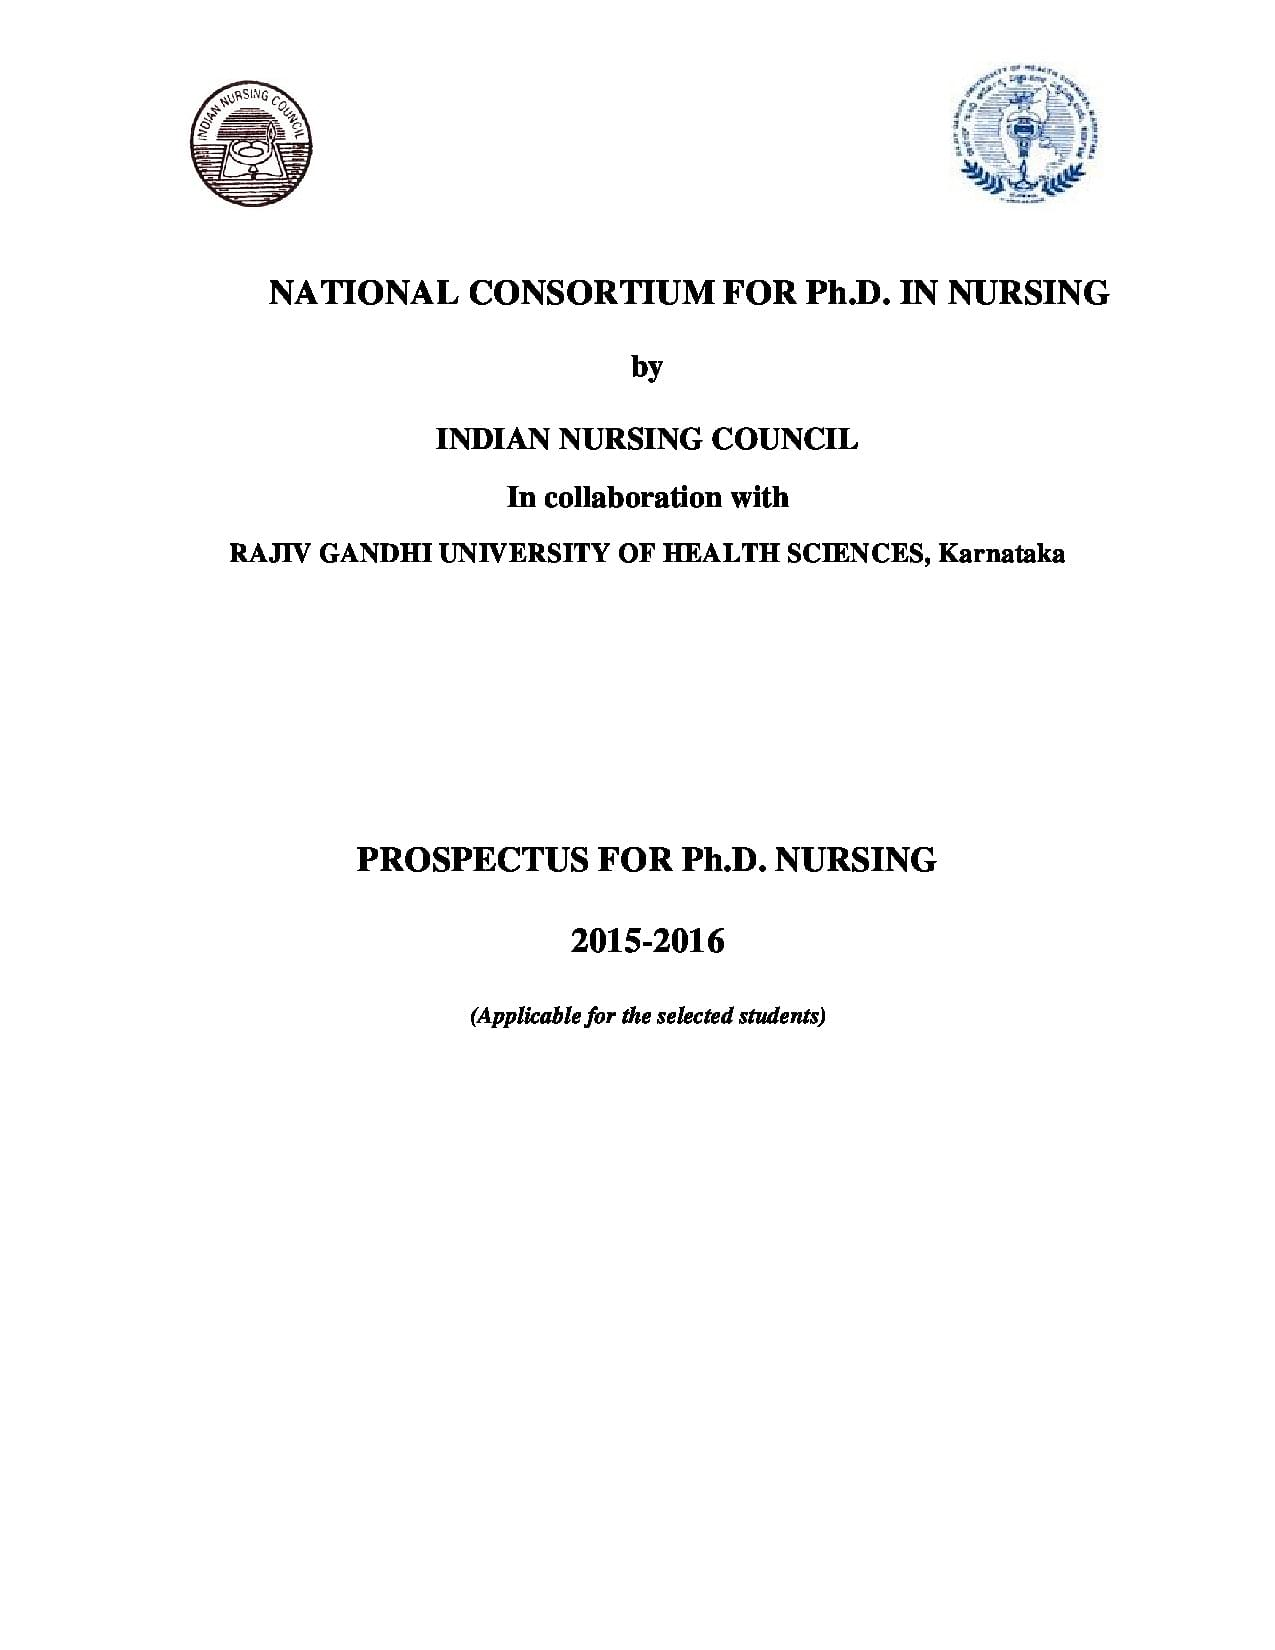 rguhs thesis topics in community medicine